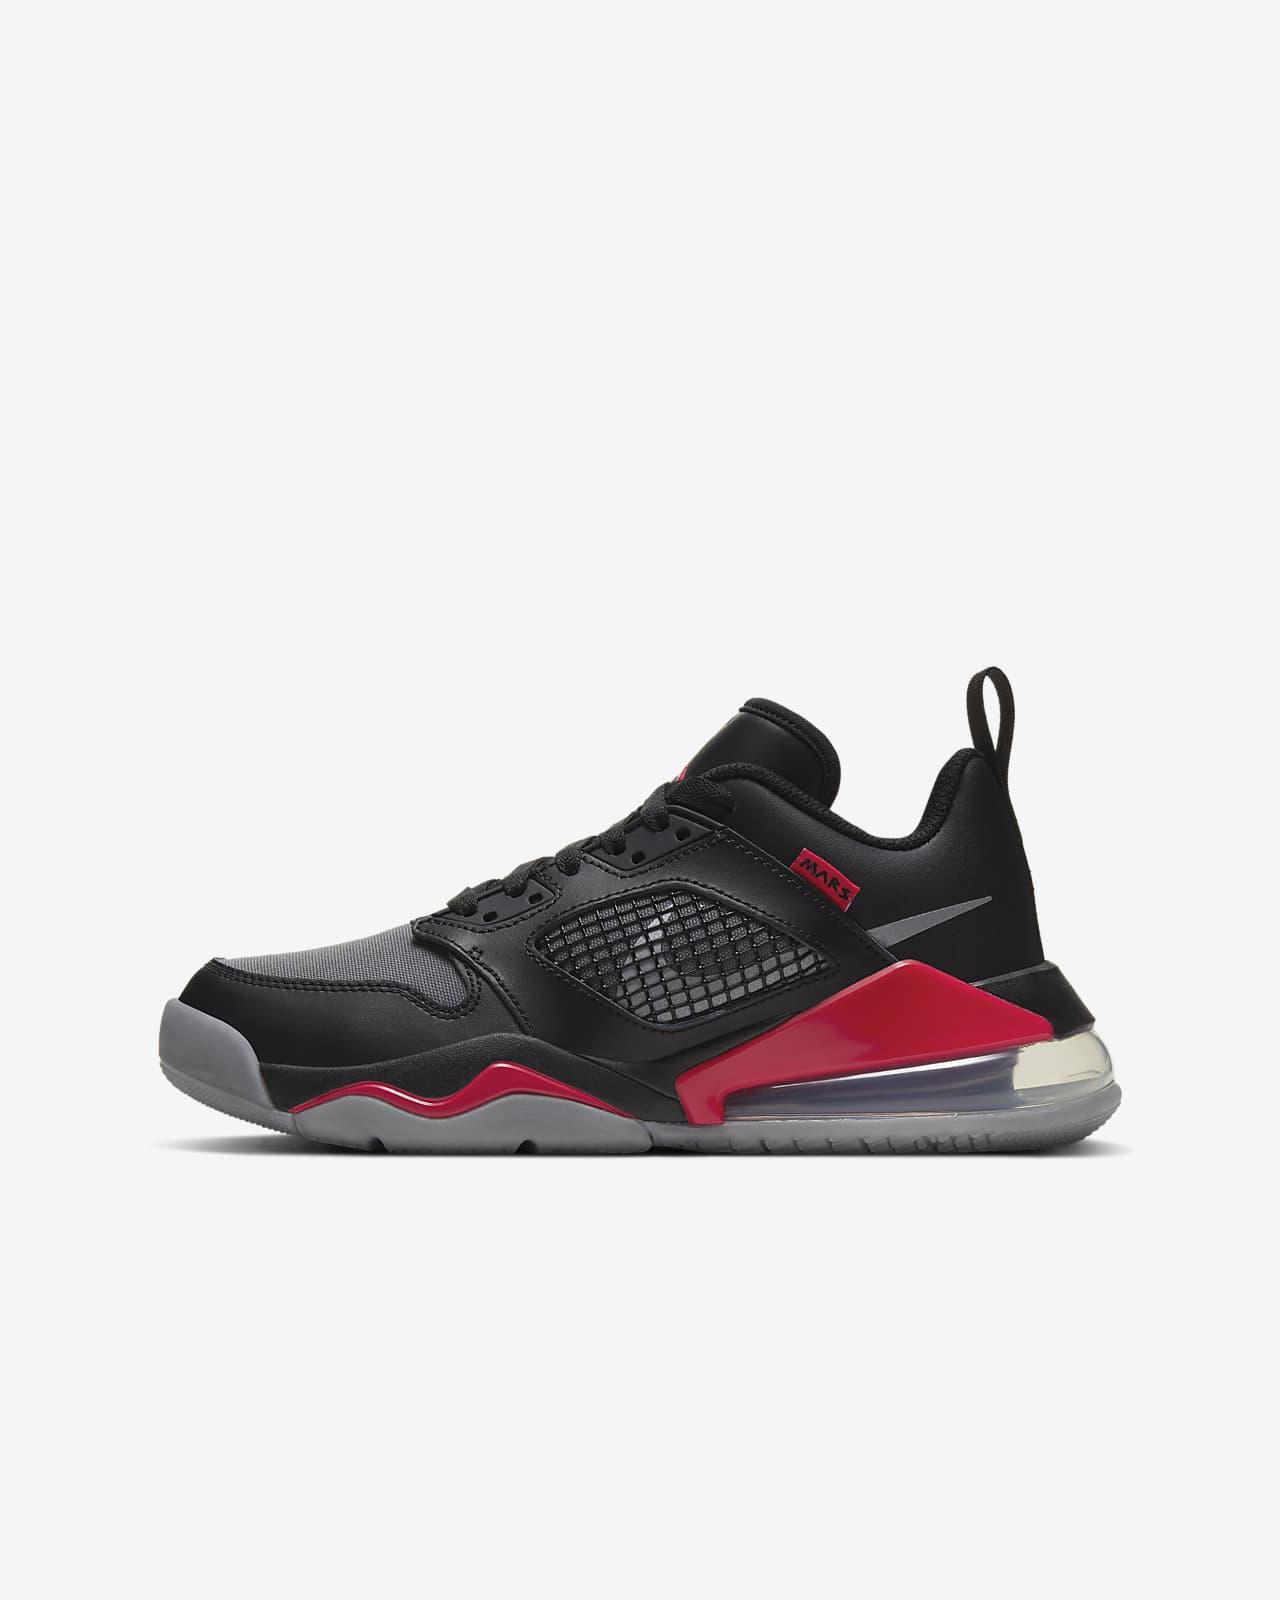 Jordan Mars 270 Low Big Kids' Shoe